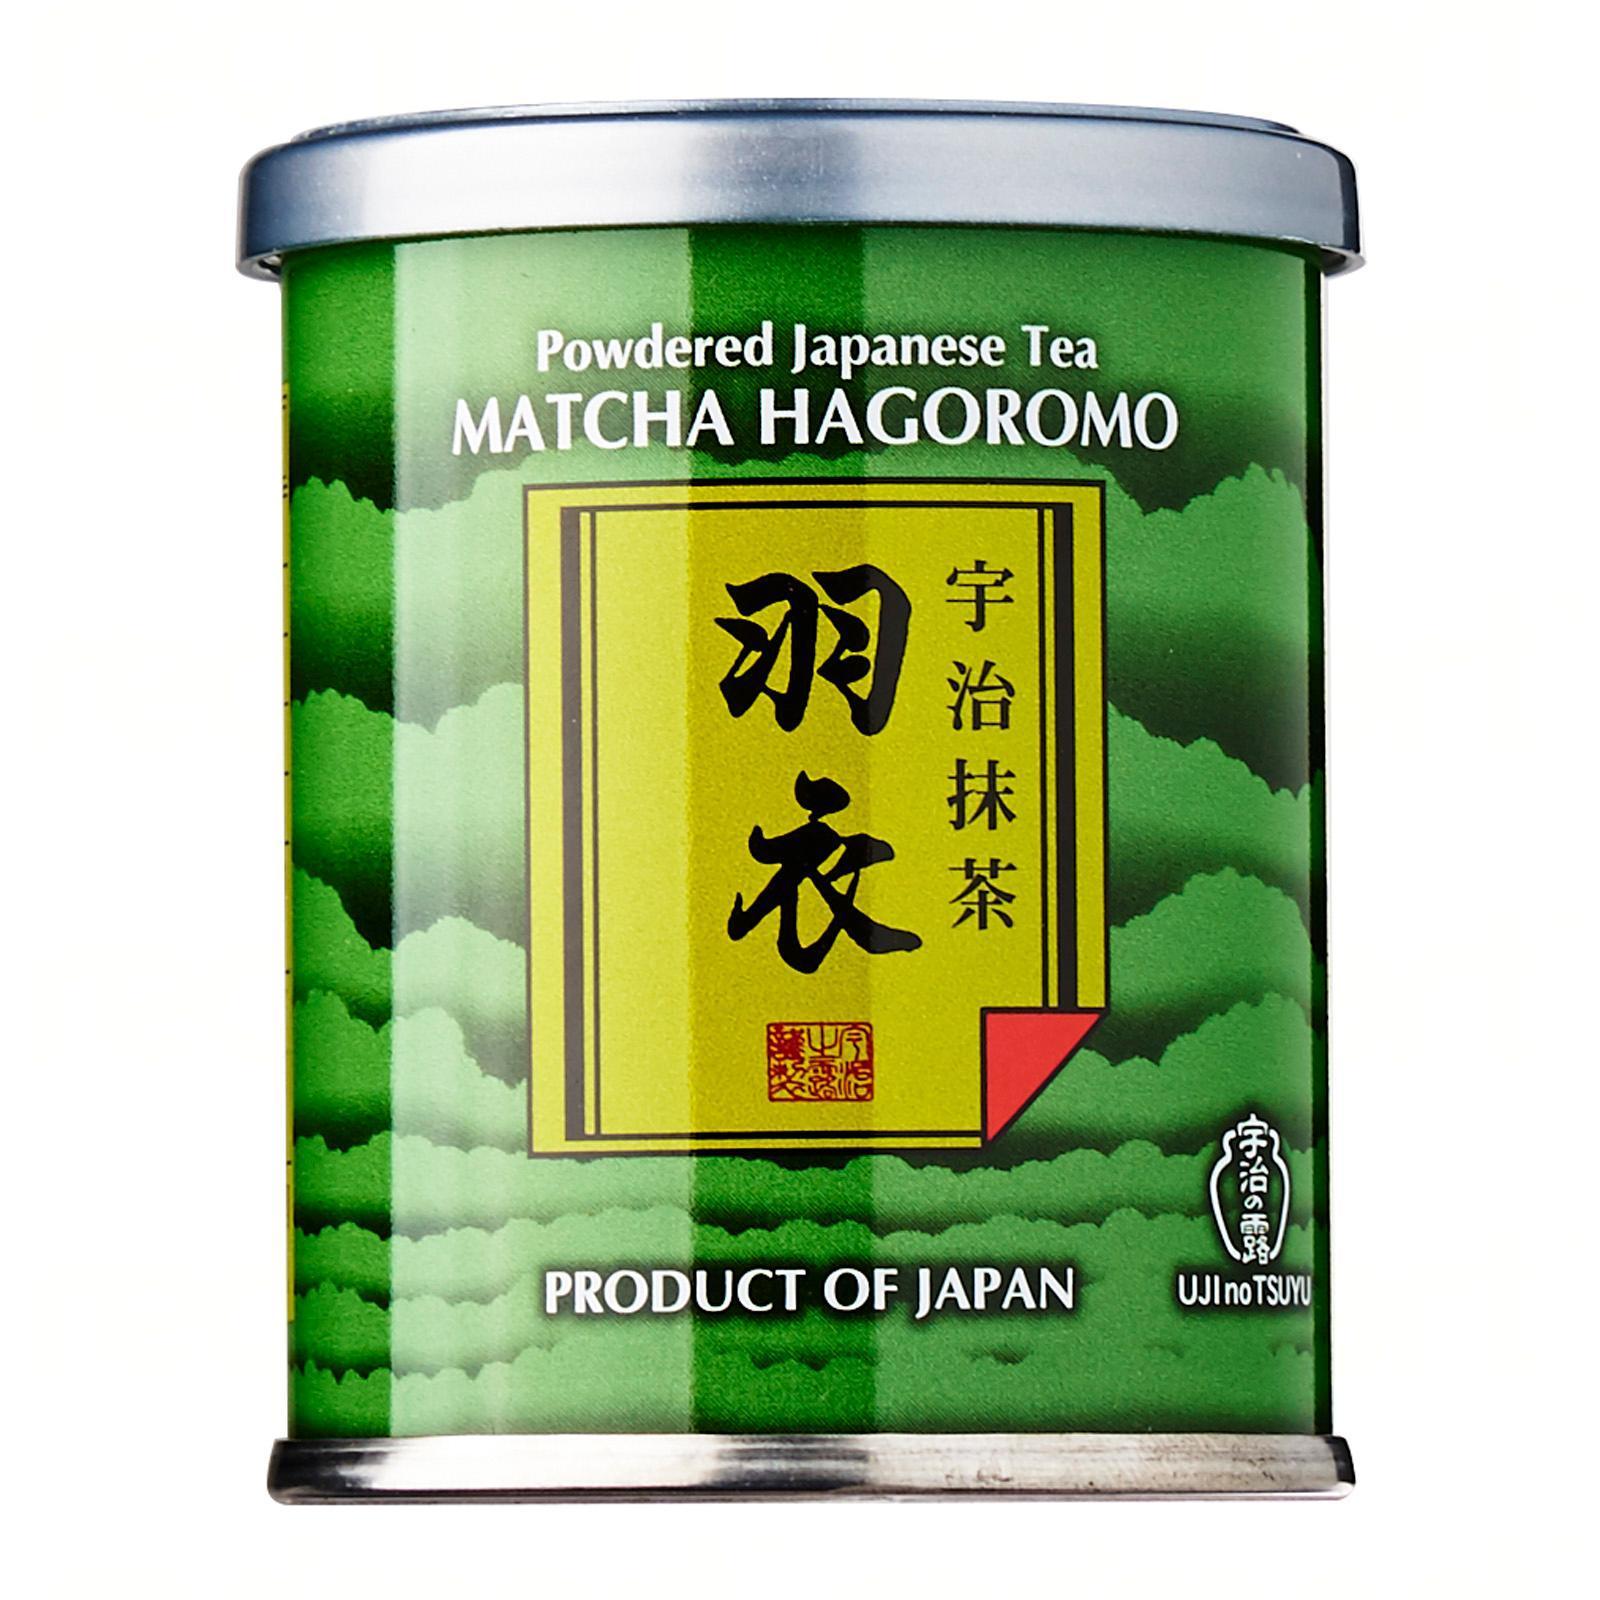 Ujinotsuyu Matcha Hagoromo Japanese Matcha Powder - by J-mart Japanese Food Market